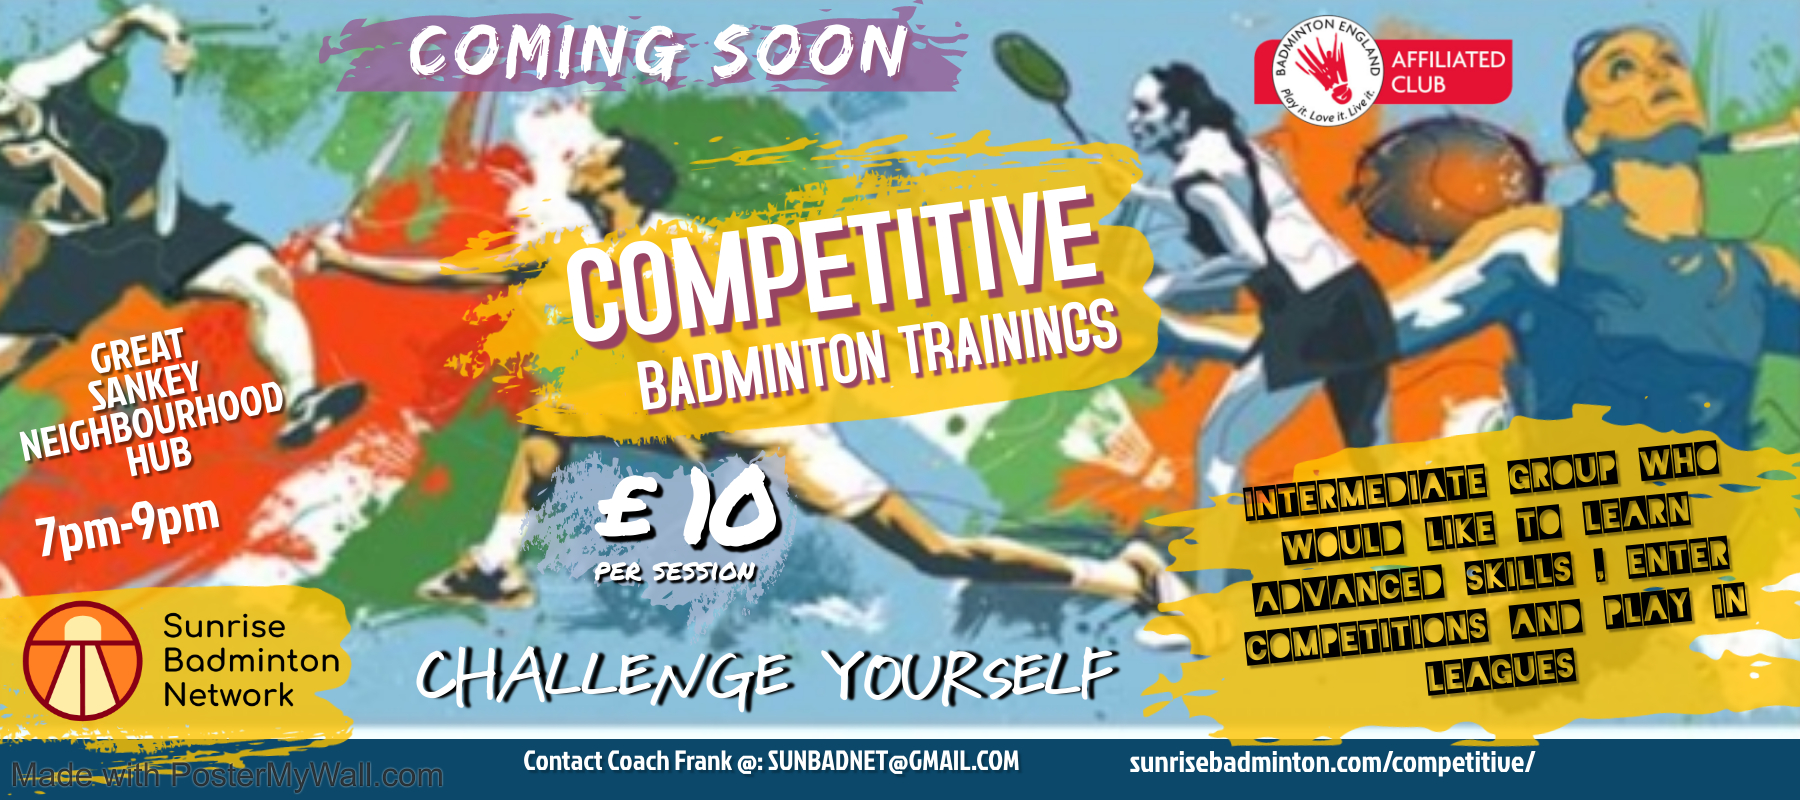 Featured-Sunrise-Competitive-Badminton-Mindset-Sessions-Warrington-Great-Sankey